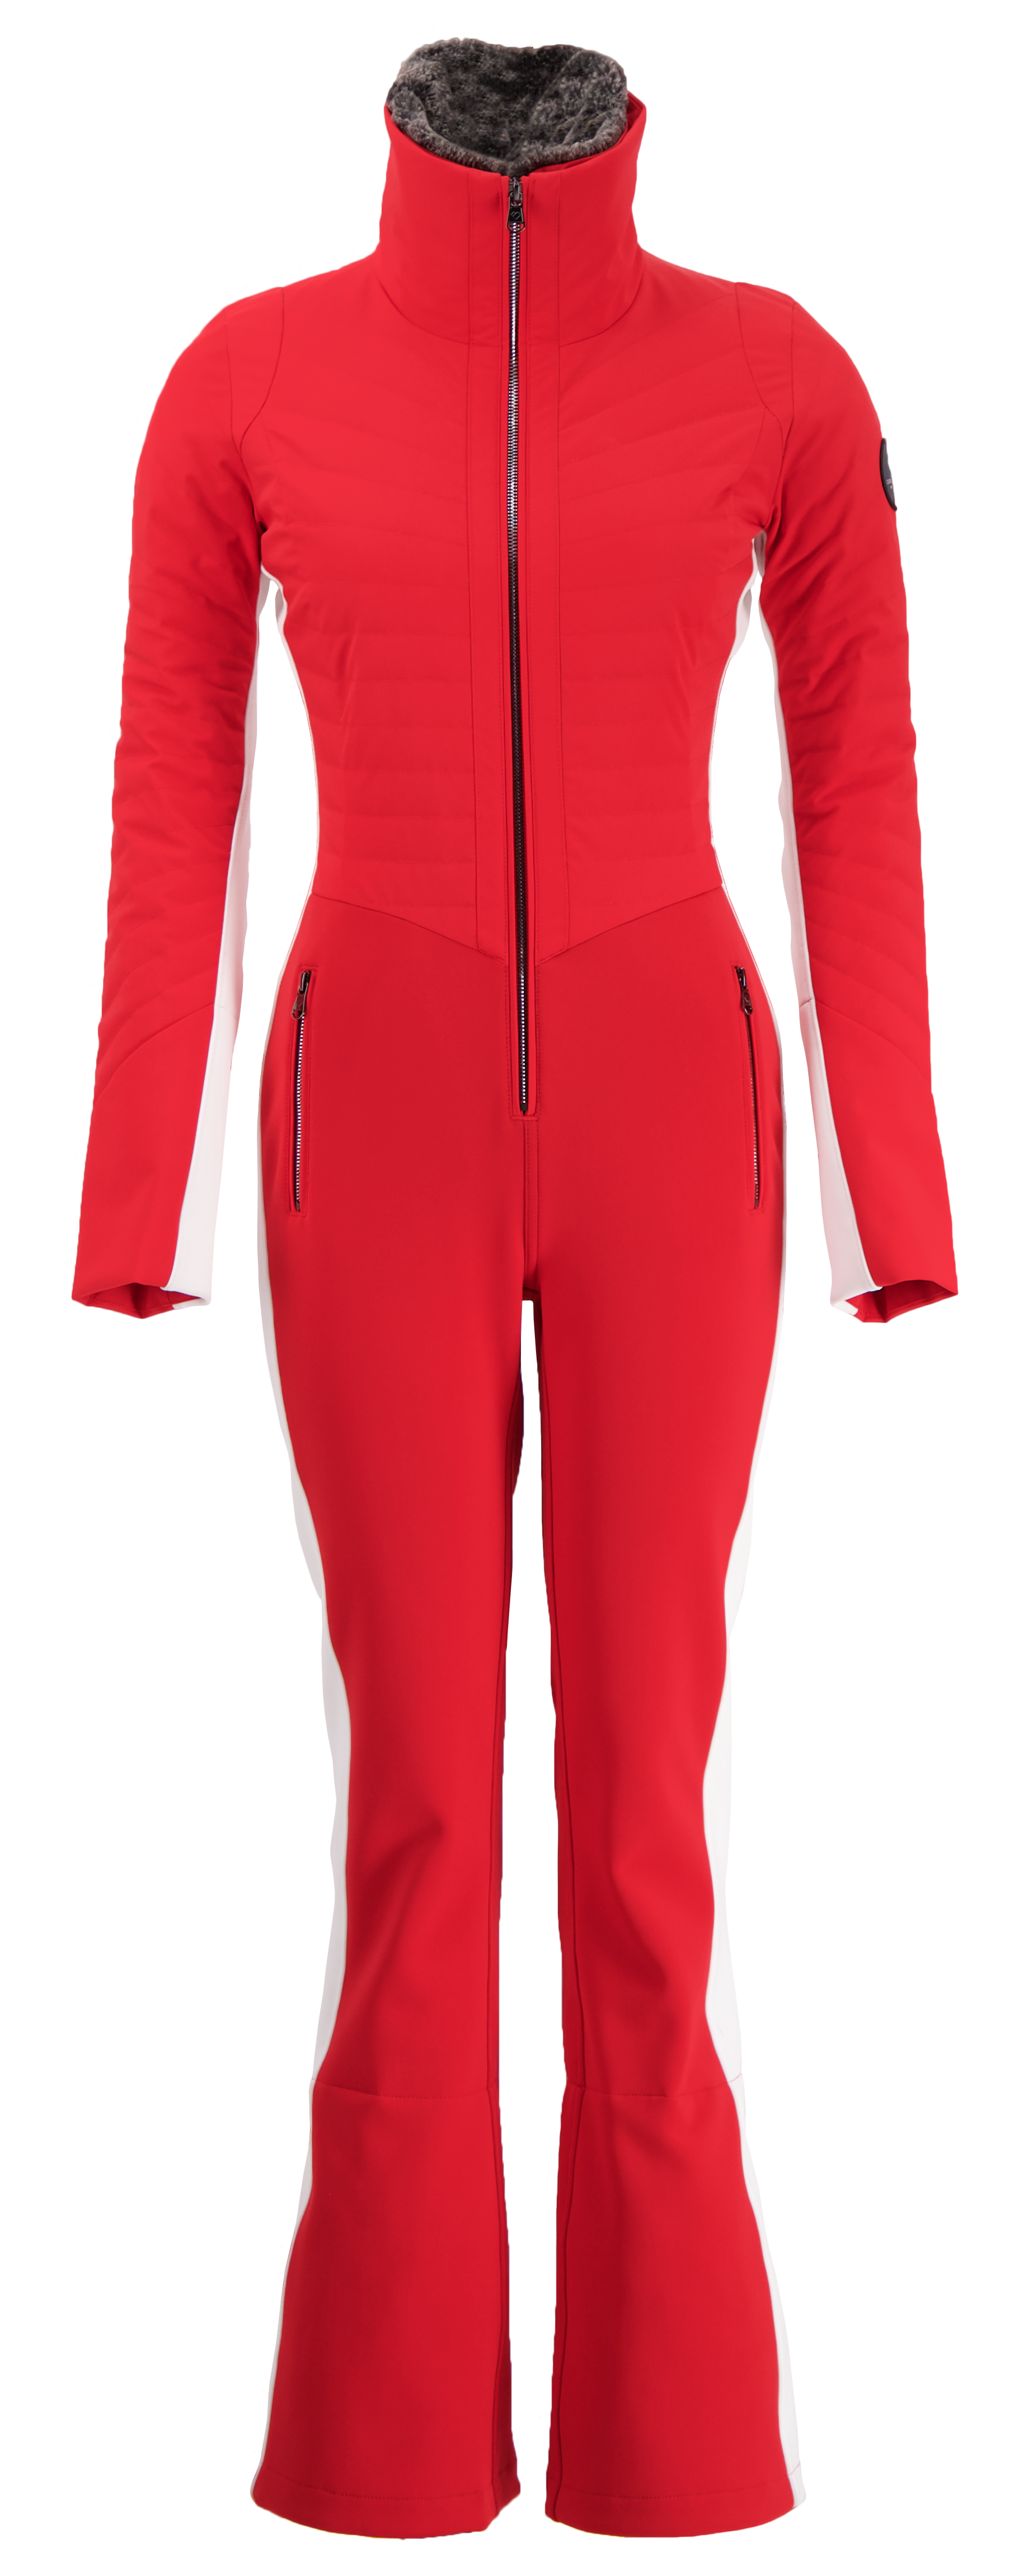 SKI Test 2012: The New Nordica Patron